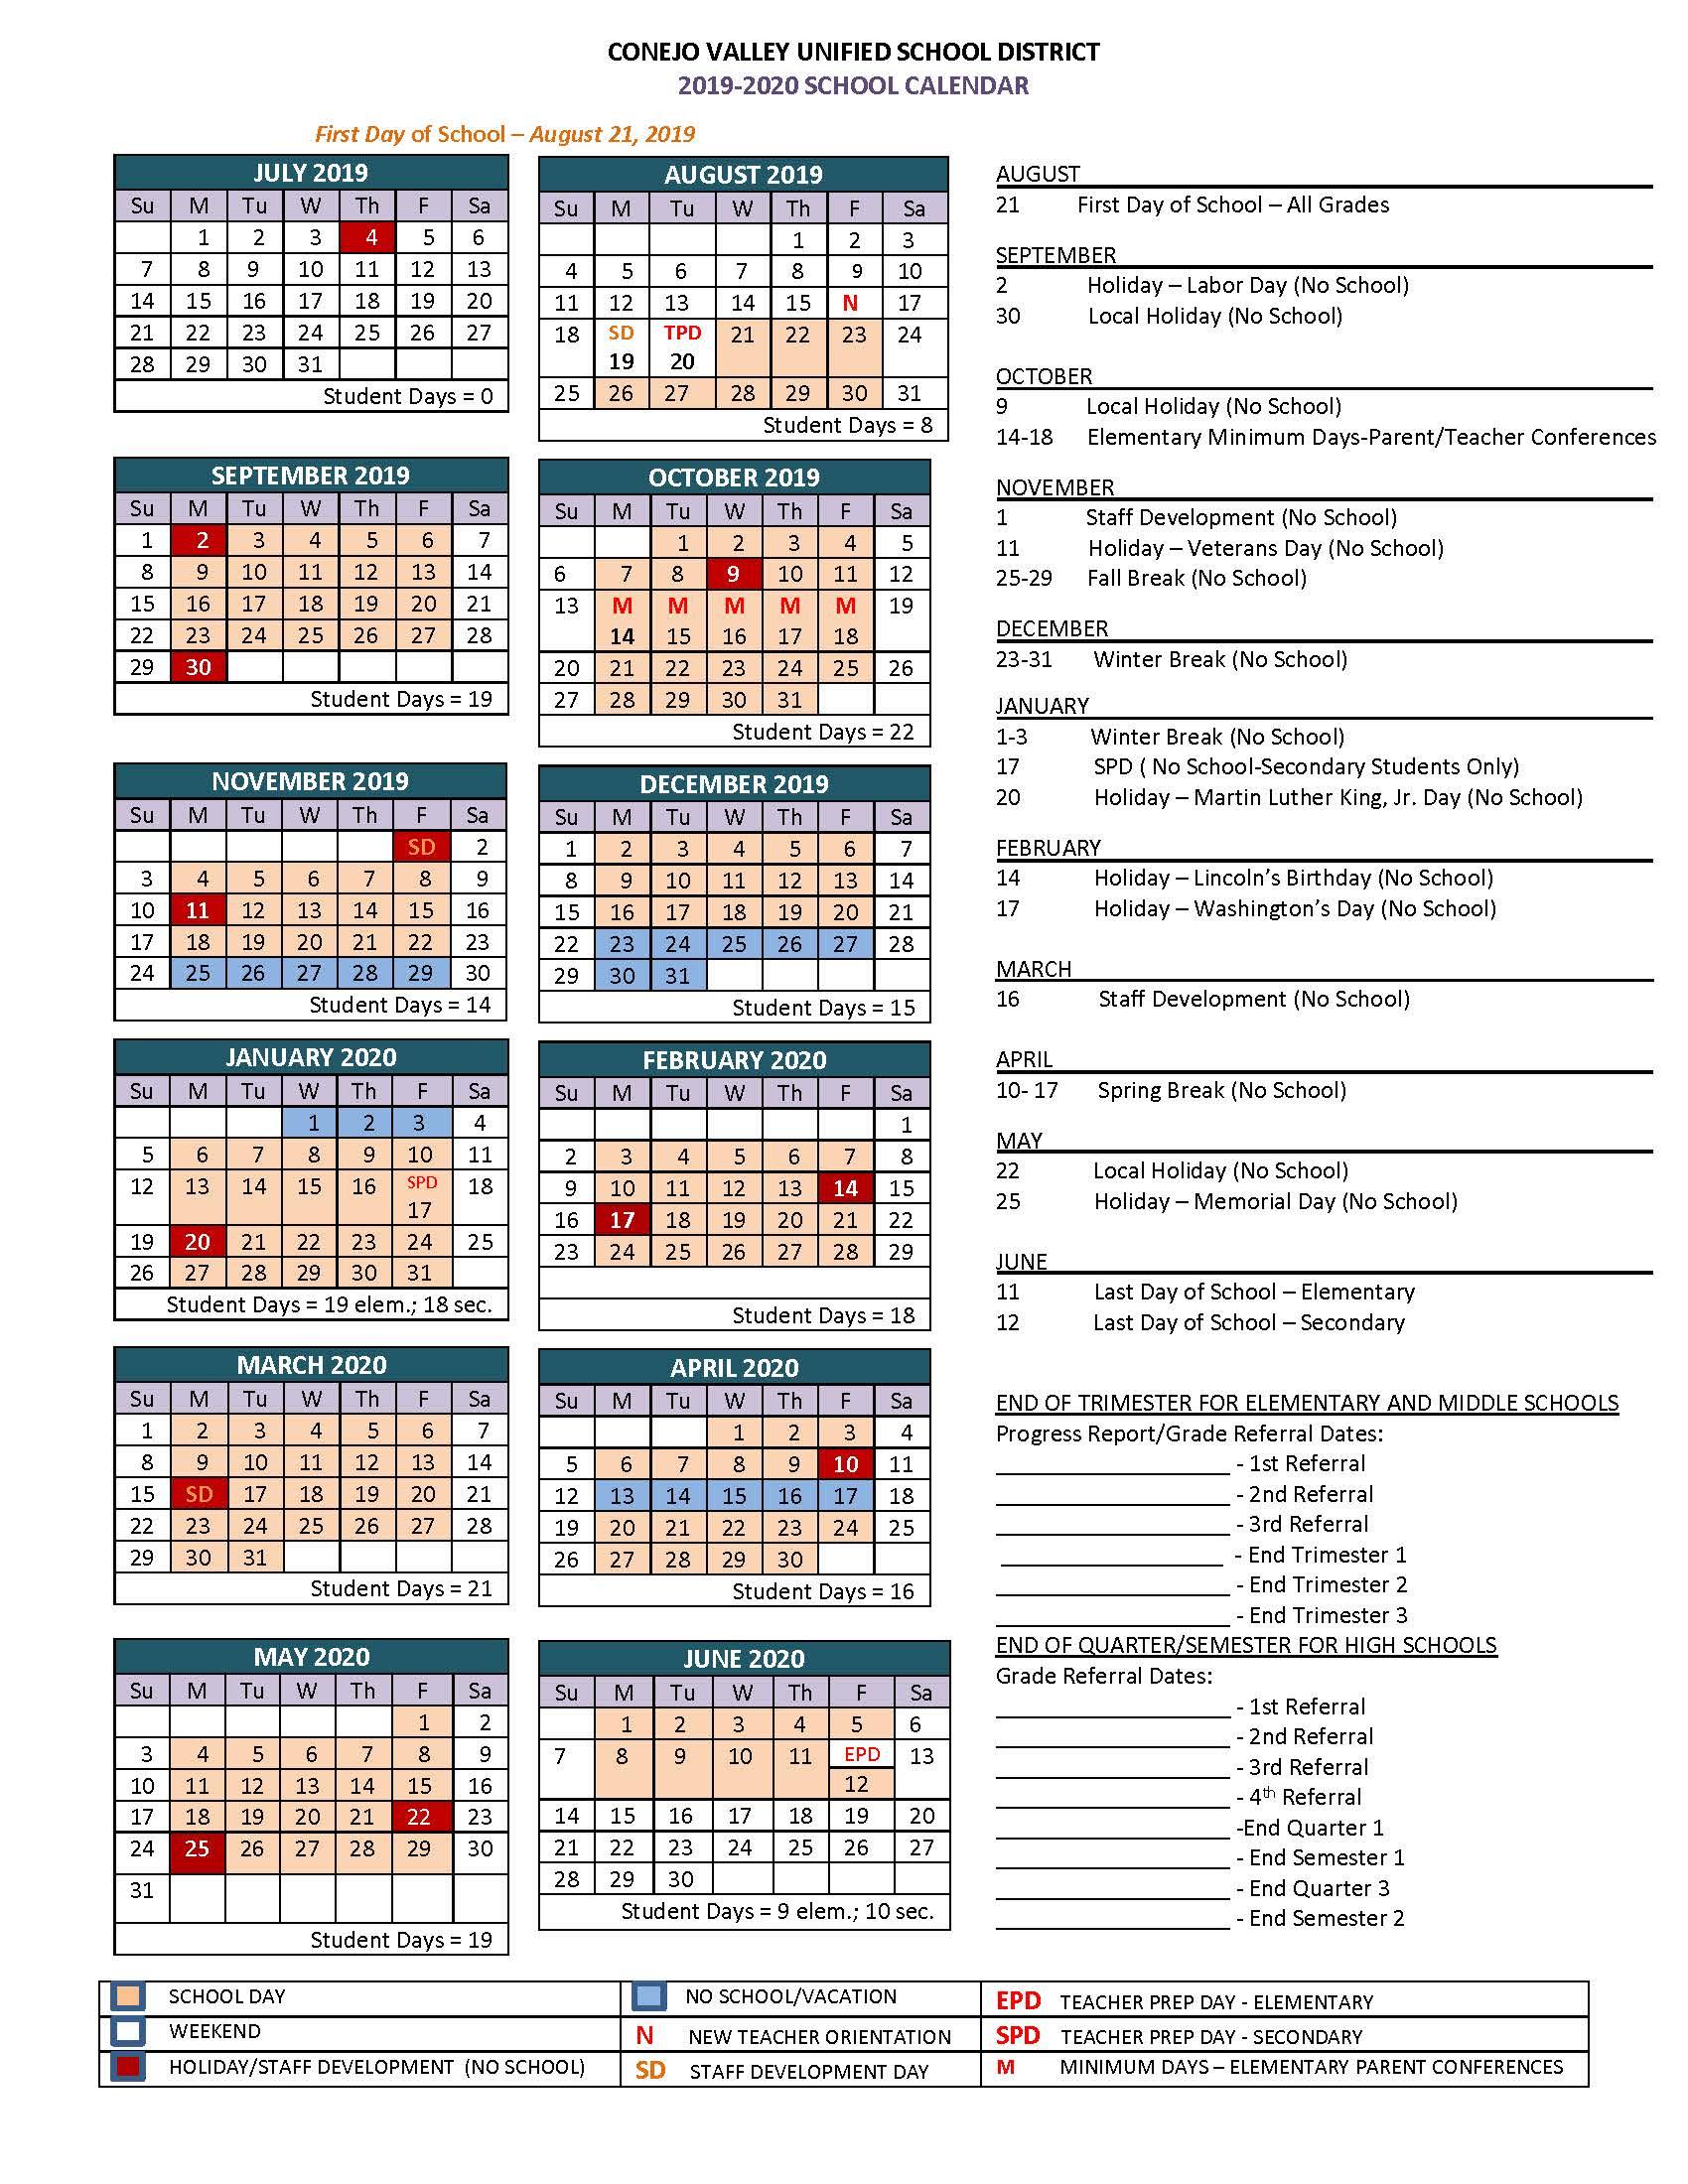 Wyoming University Calendar | Printable Calendar 2020 2021 Inside University Of Phoenix Academic Calendar